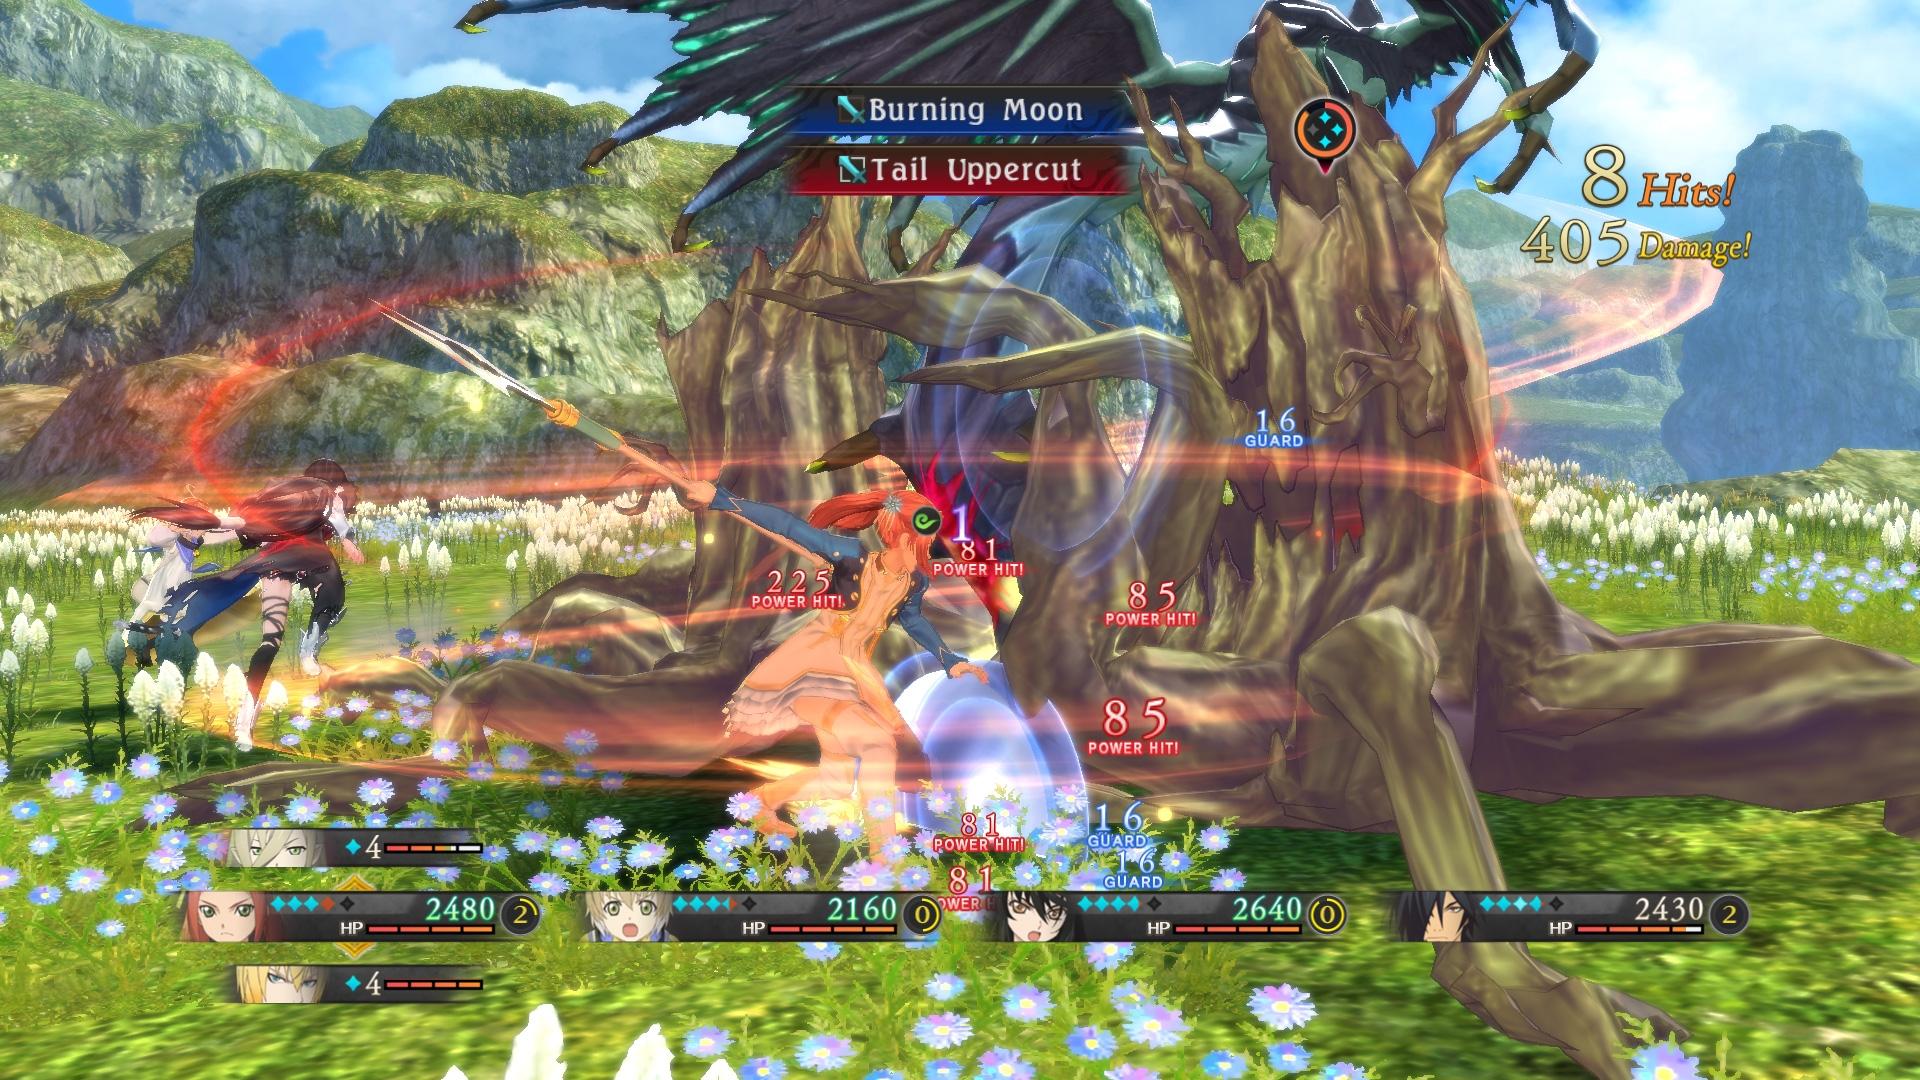 Tales of Berseria (Playstation 4) | Bandai Namco Store